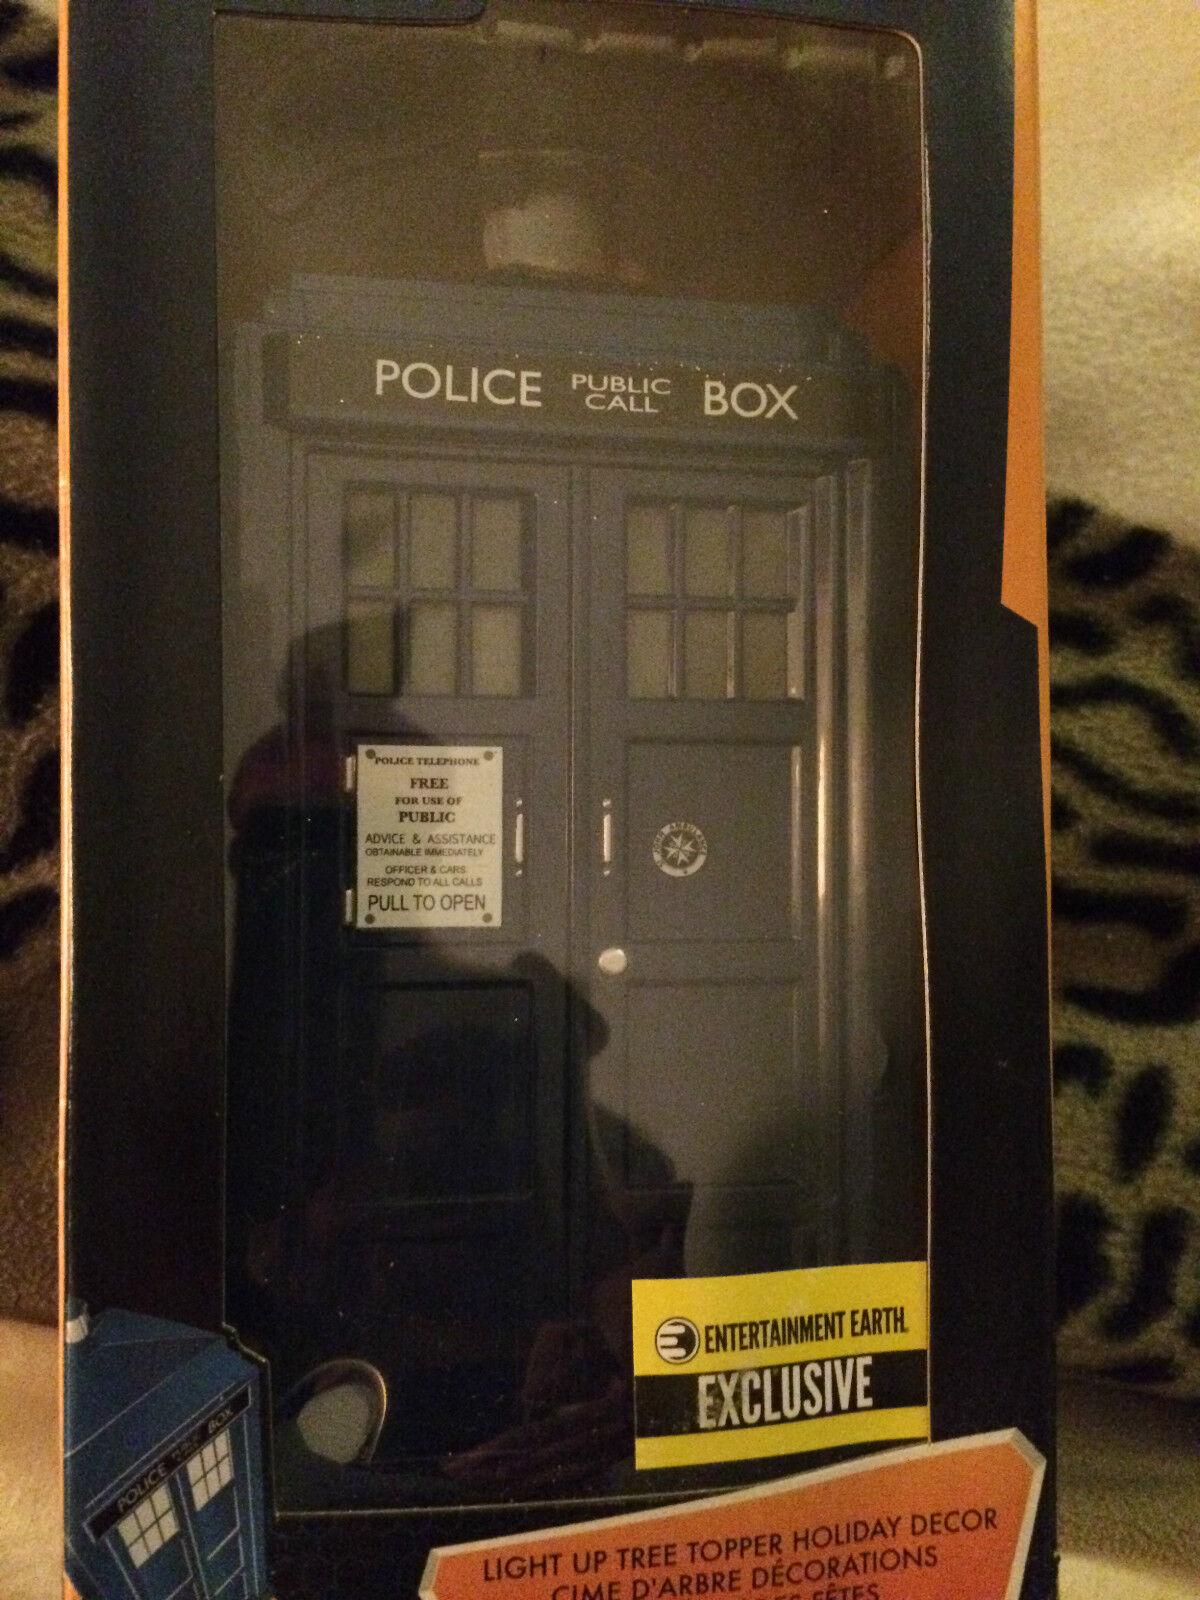 Doctor Who Tardis Kurts Aliso Topper súperior árbol de Navidad